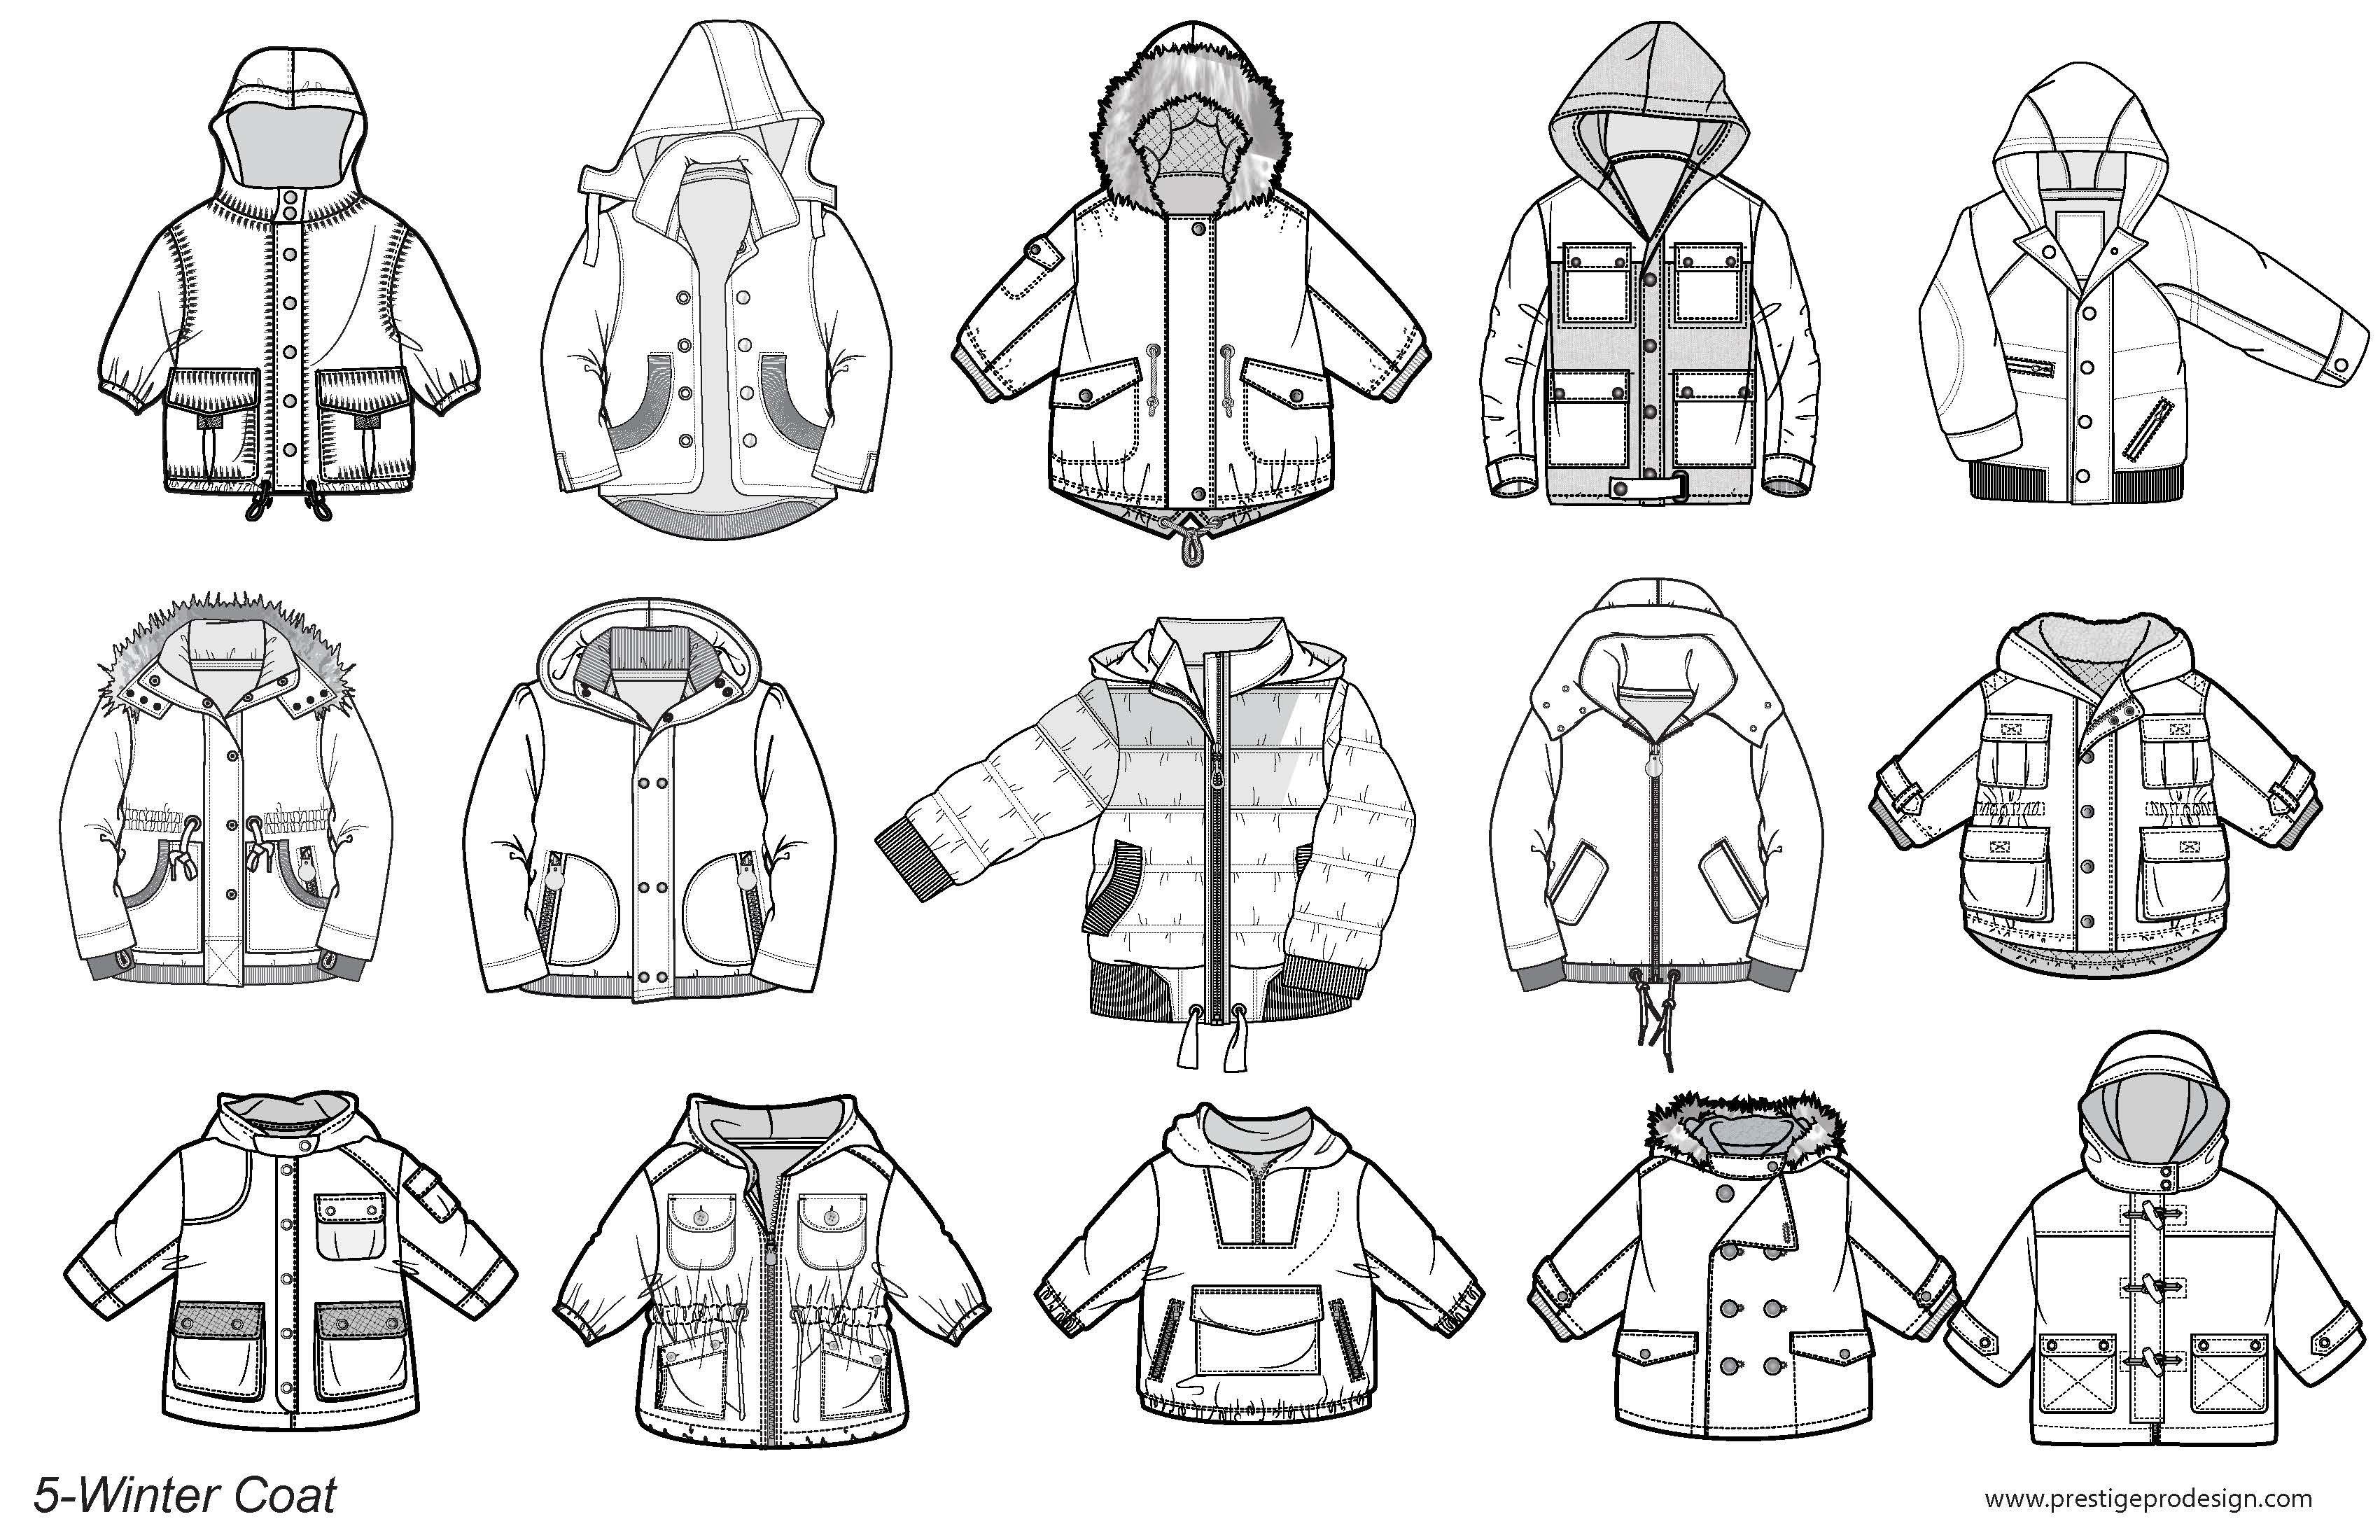 Illustrator Fashion Templates For Kids Eskiz Modeli Eskiz Vykrojki Detskoj Odezhdy